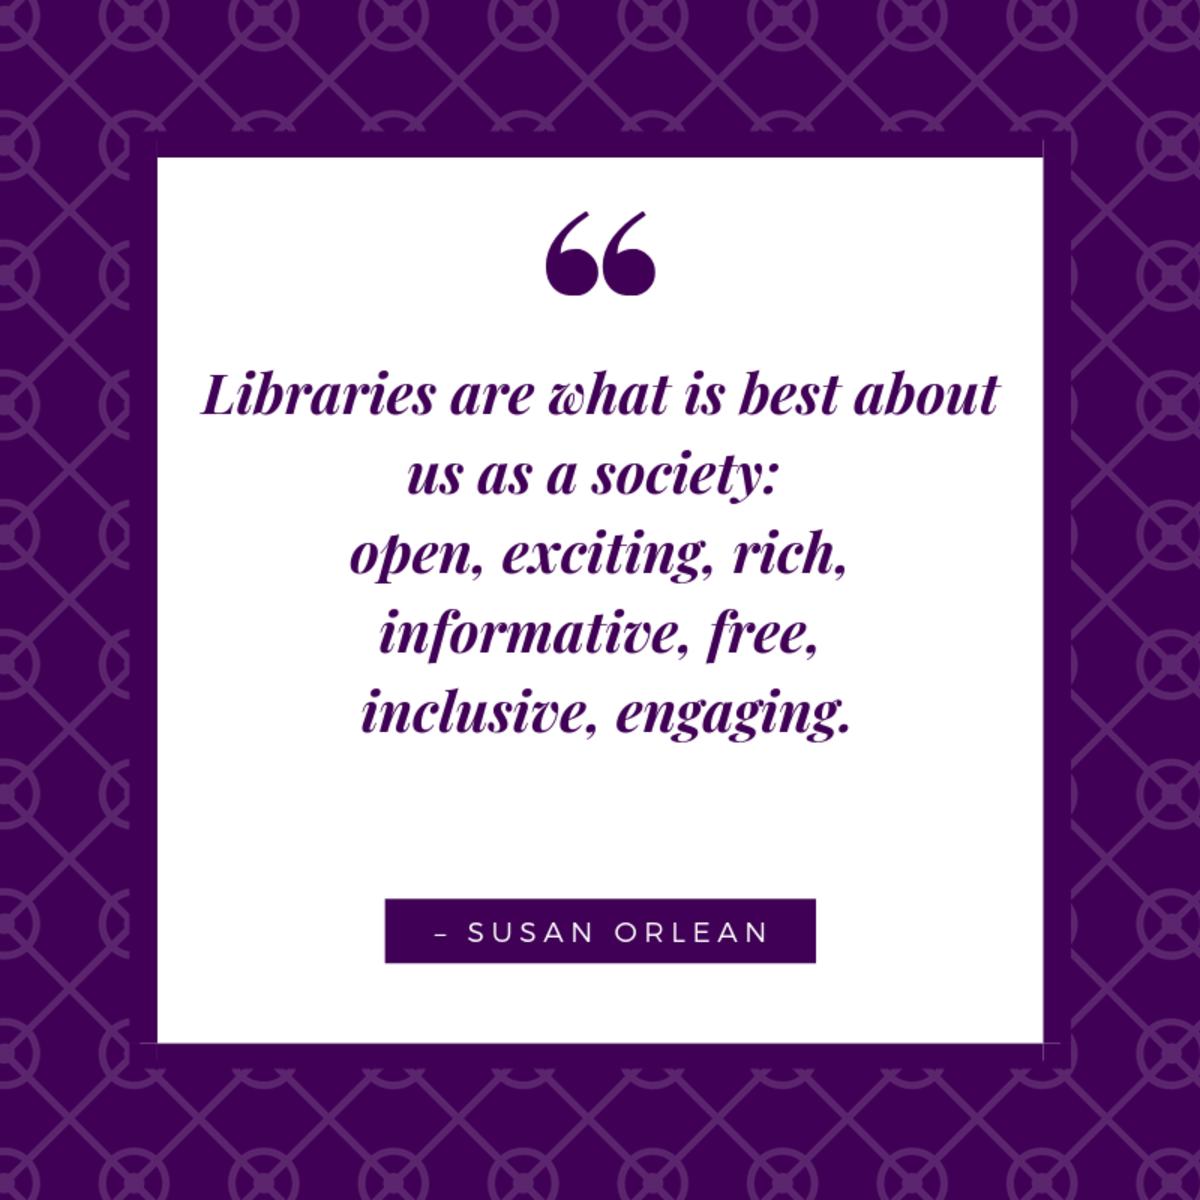 Susan Orleans quote